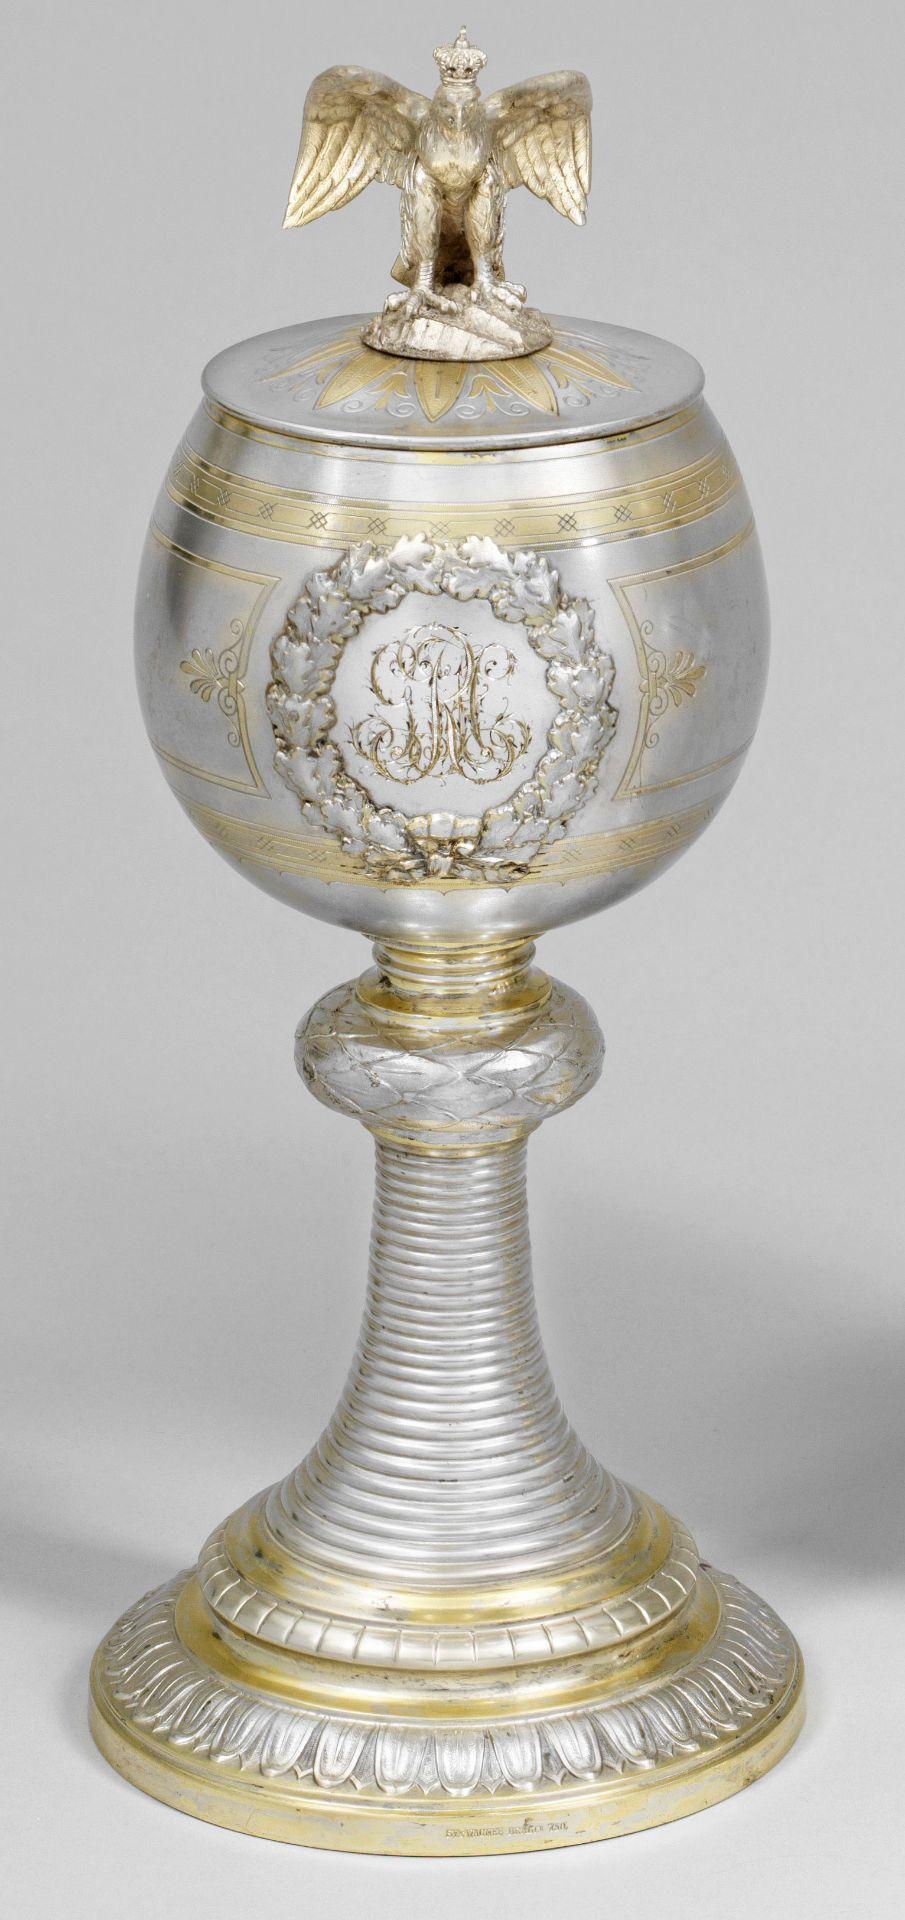 Großer preußischer Andenken-Pokal